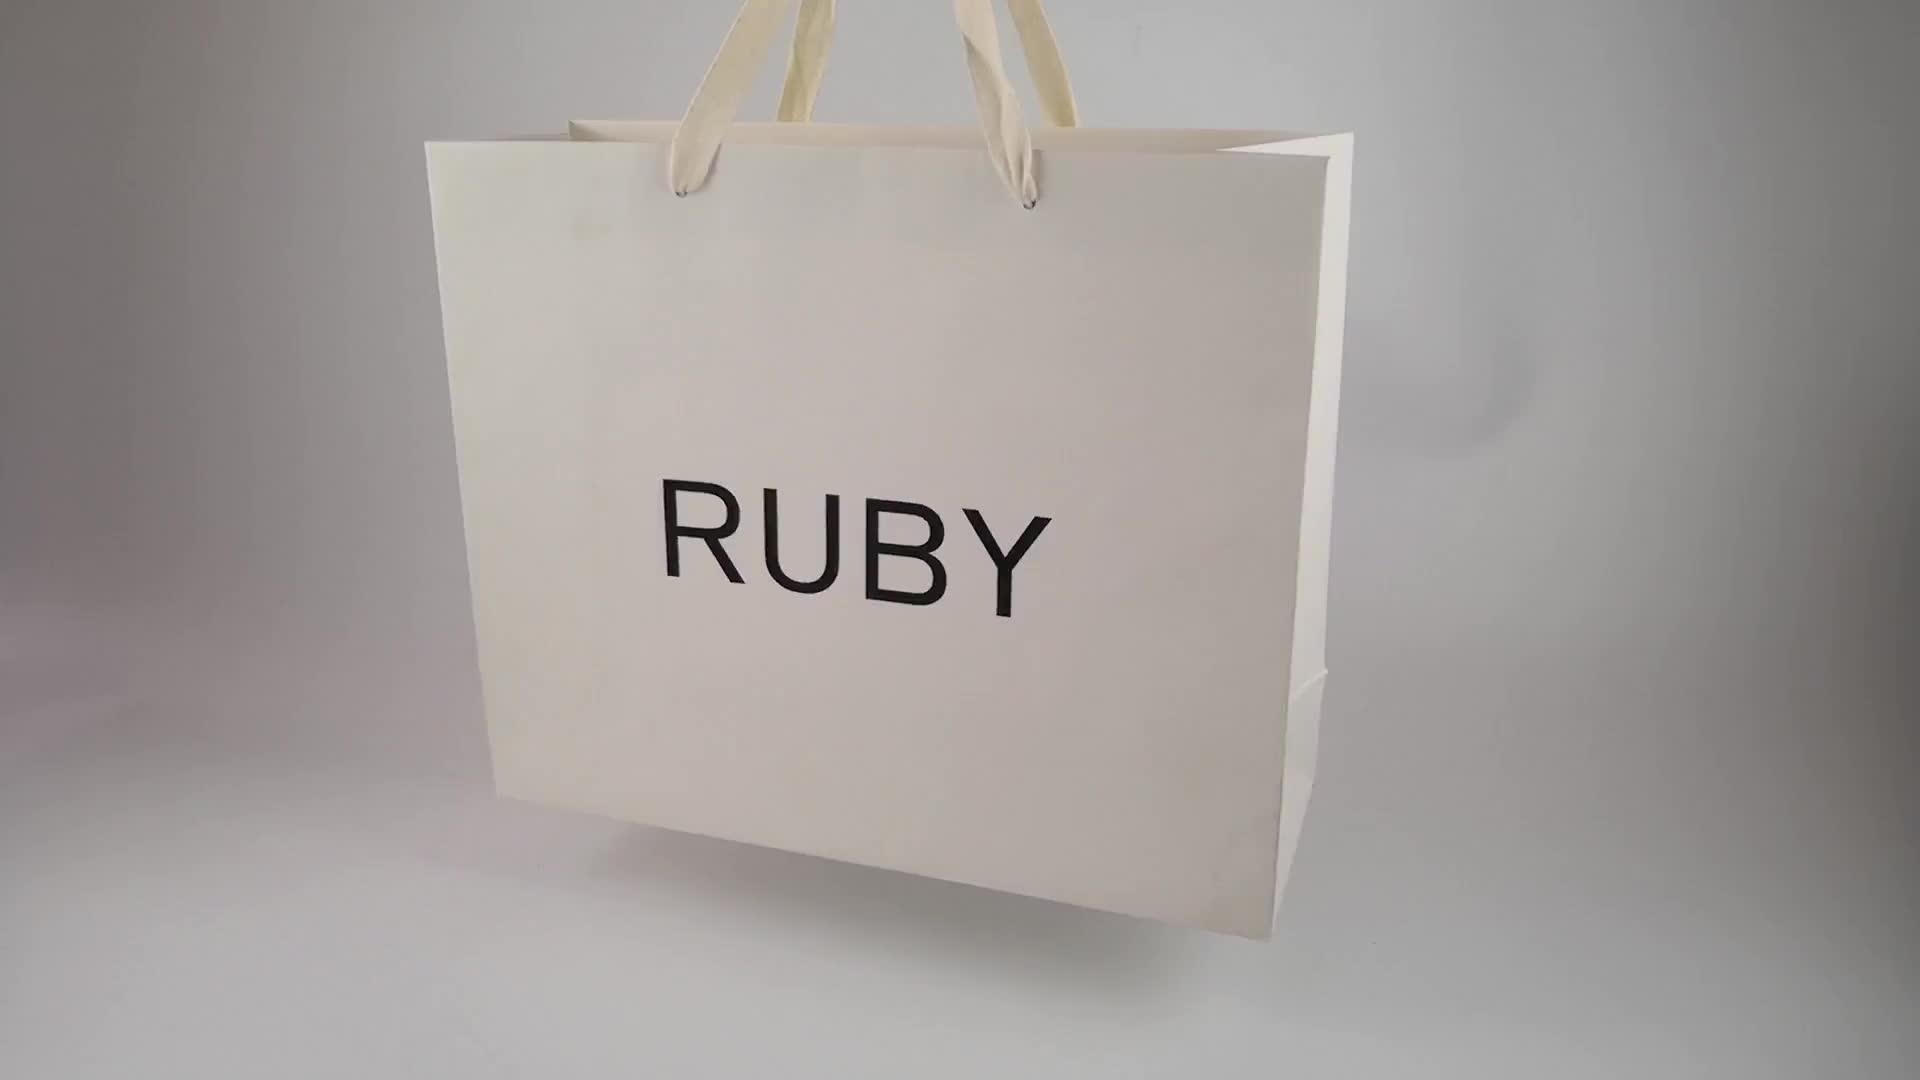 Özel baskılı kraft kağıt torba/parfüm kağıt torba/kağıt torba parfüm butik